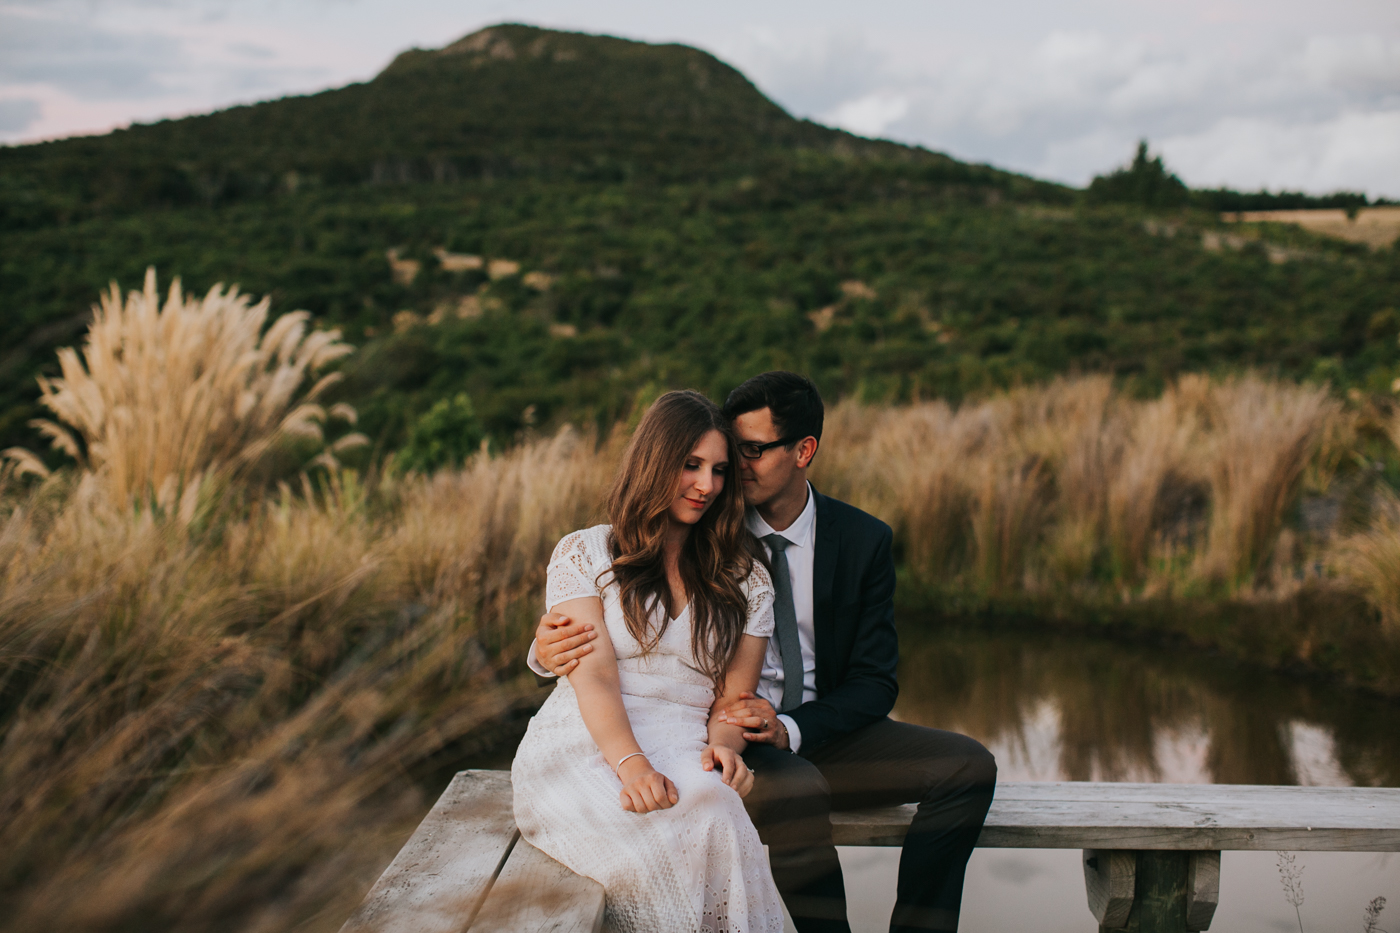 Ariana & Tim - Dunedin, New Zealand Wedding - Destination Wedding - Samantha Heather Photography-259.jpg